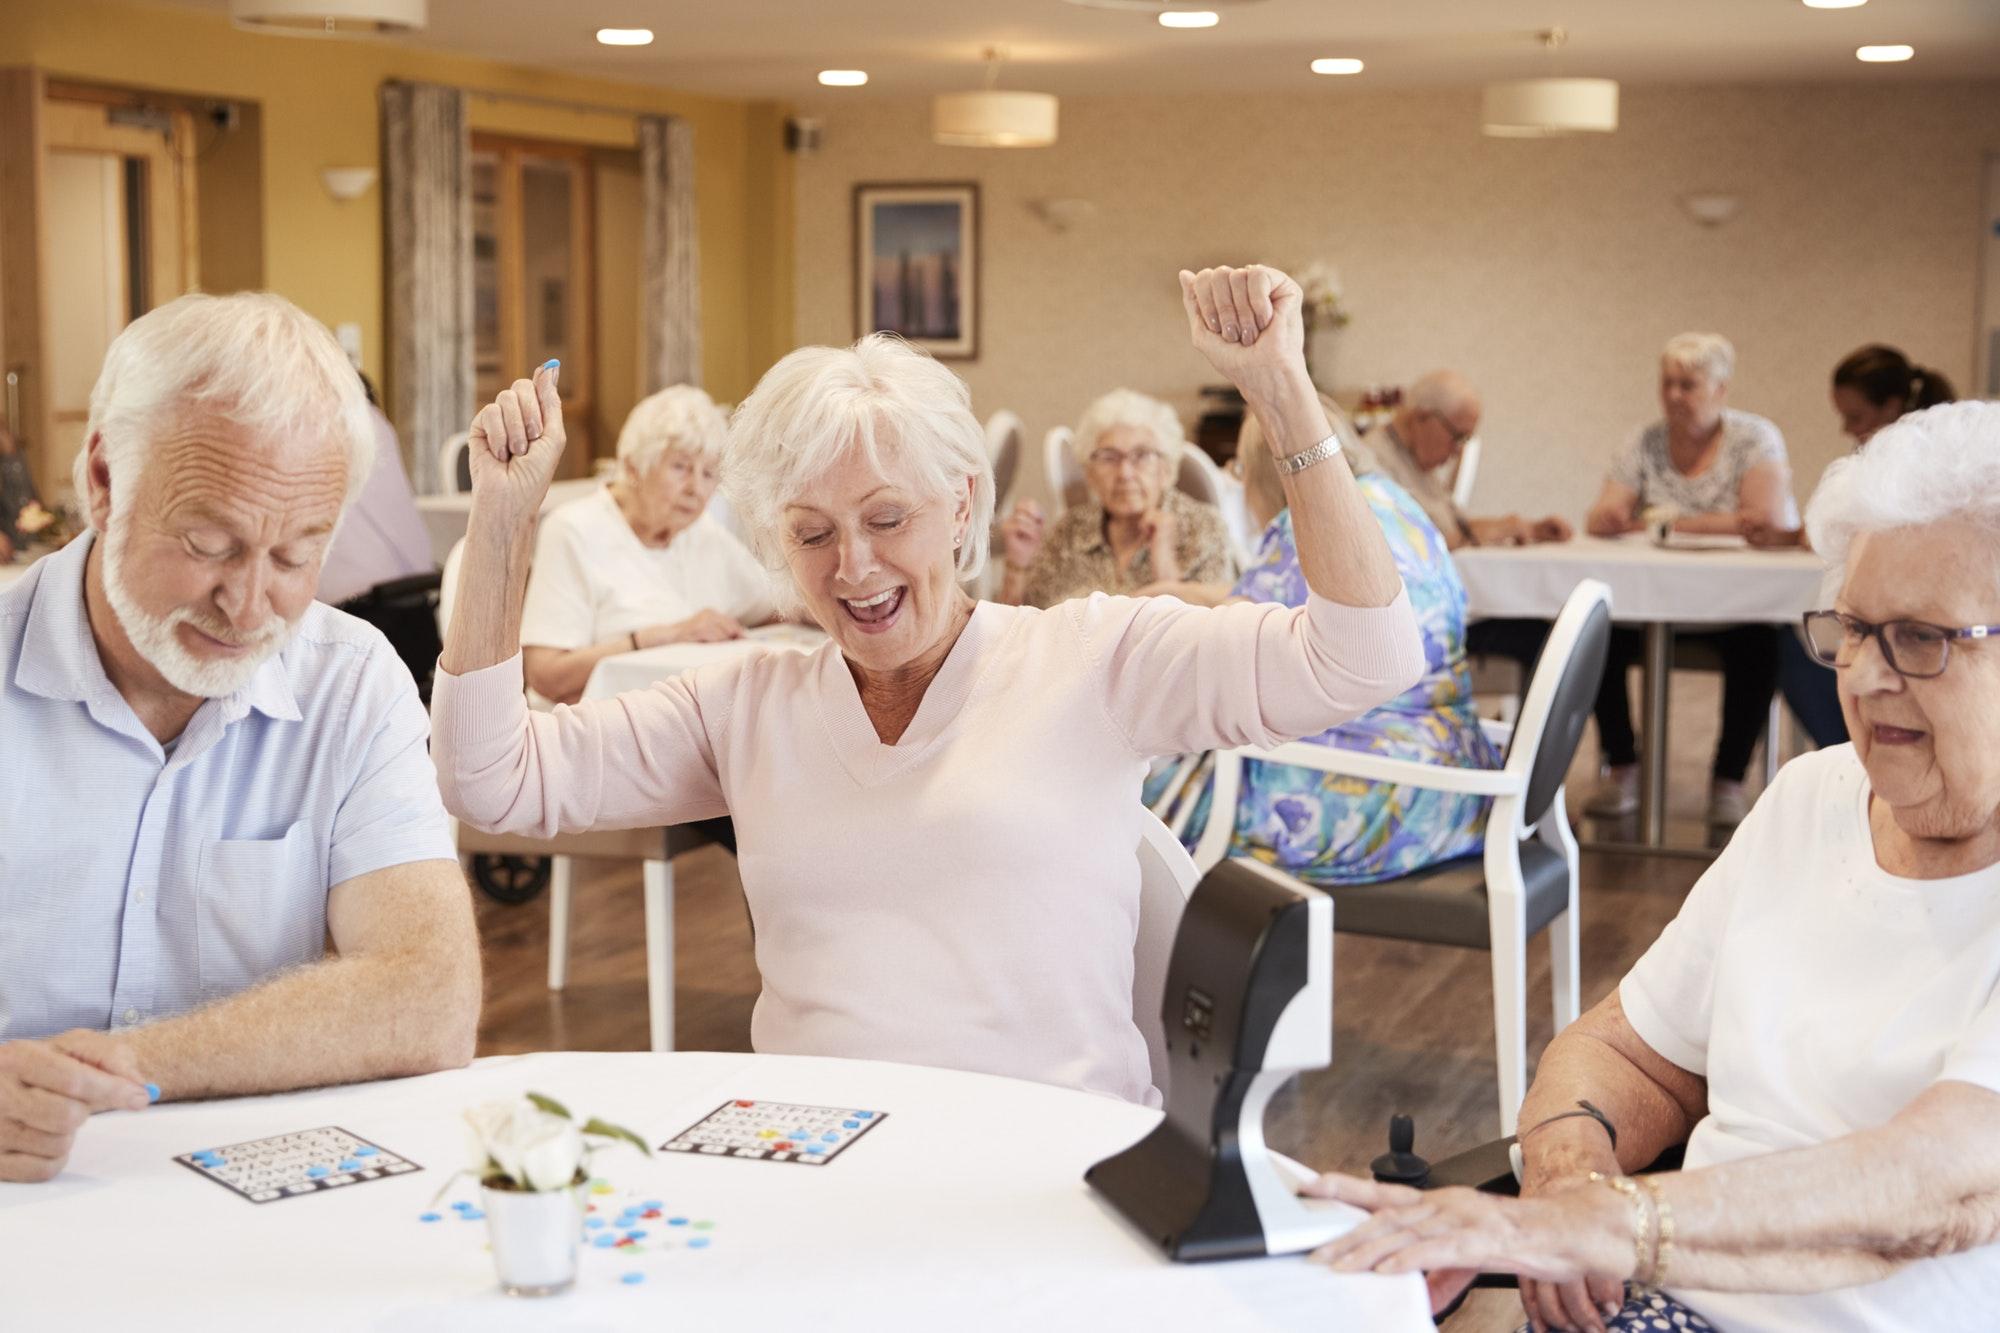 Senior Woman Winning Game Of Bingo In Retirement Home